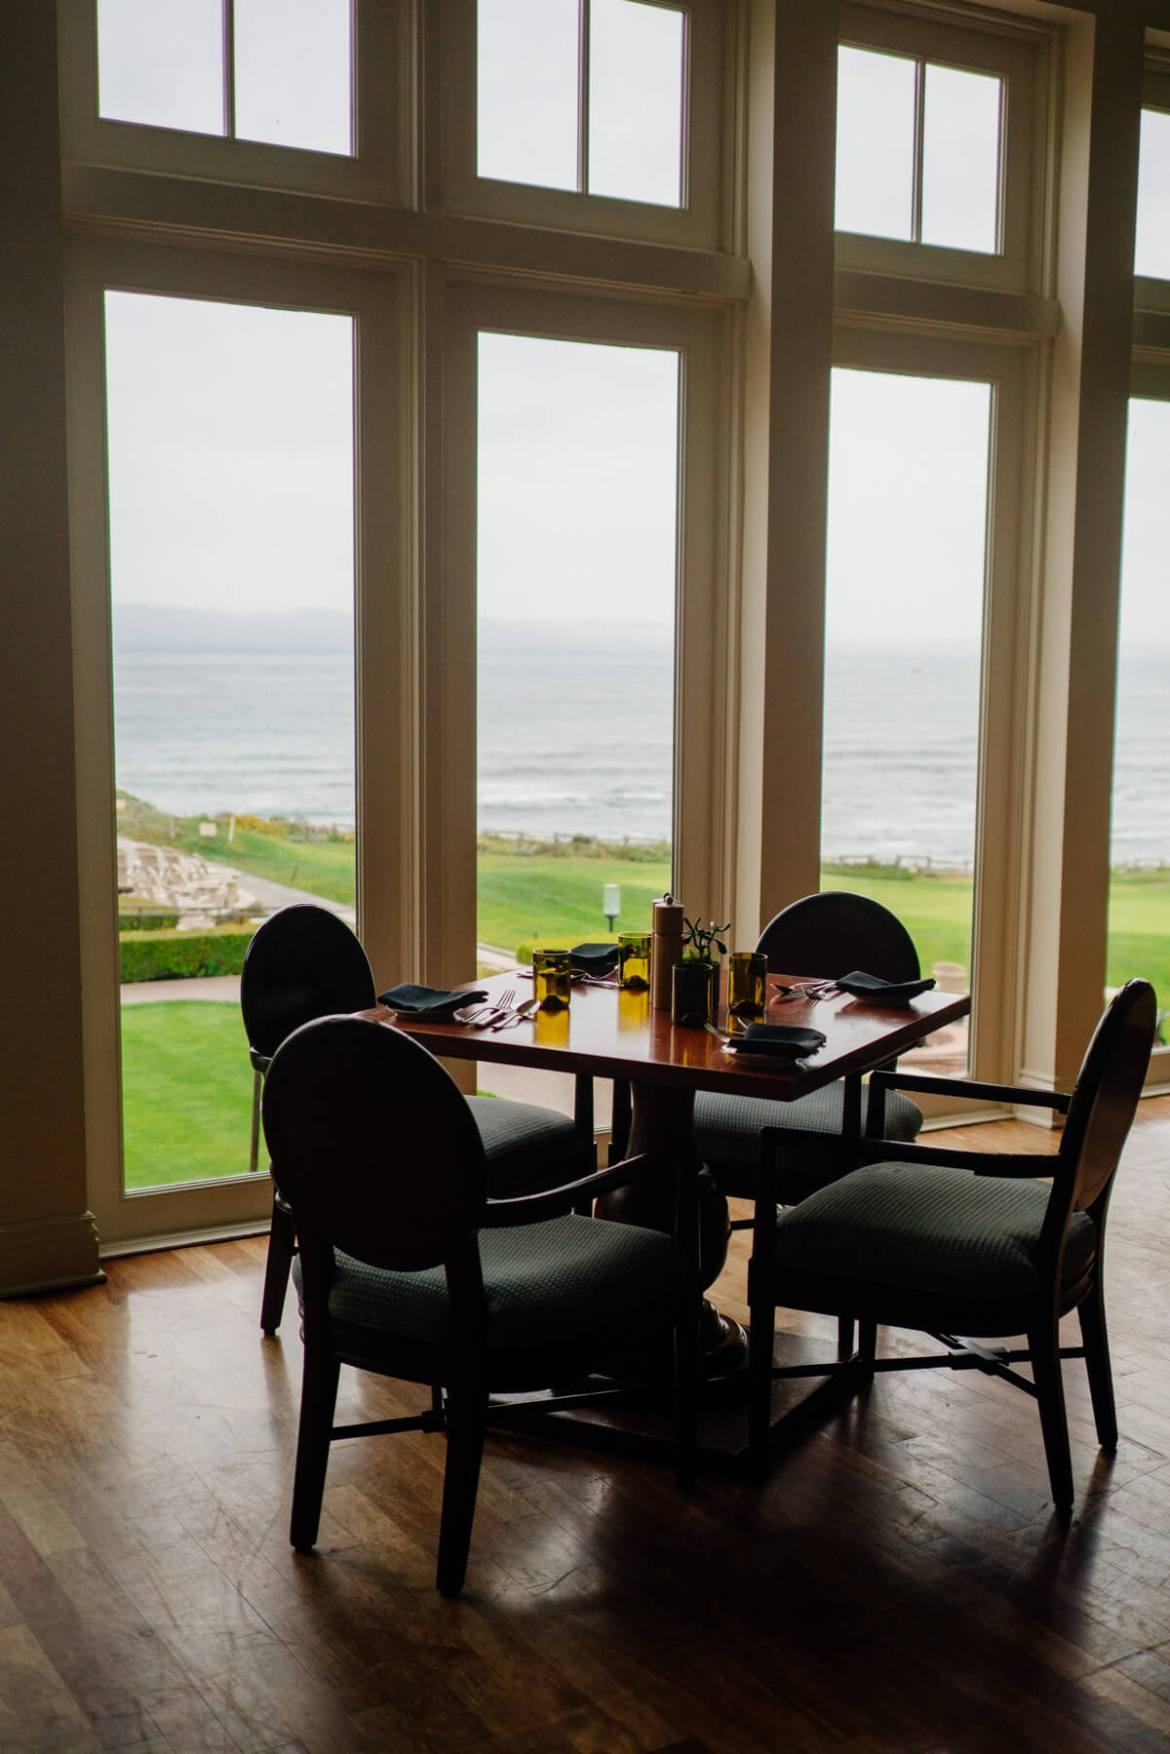 Large windows look over the ocean at The Ritz-Carlton Half Moon Bay